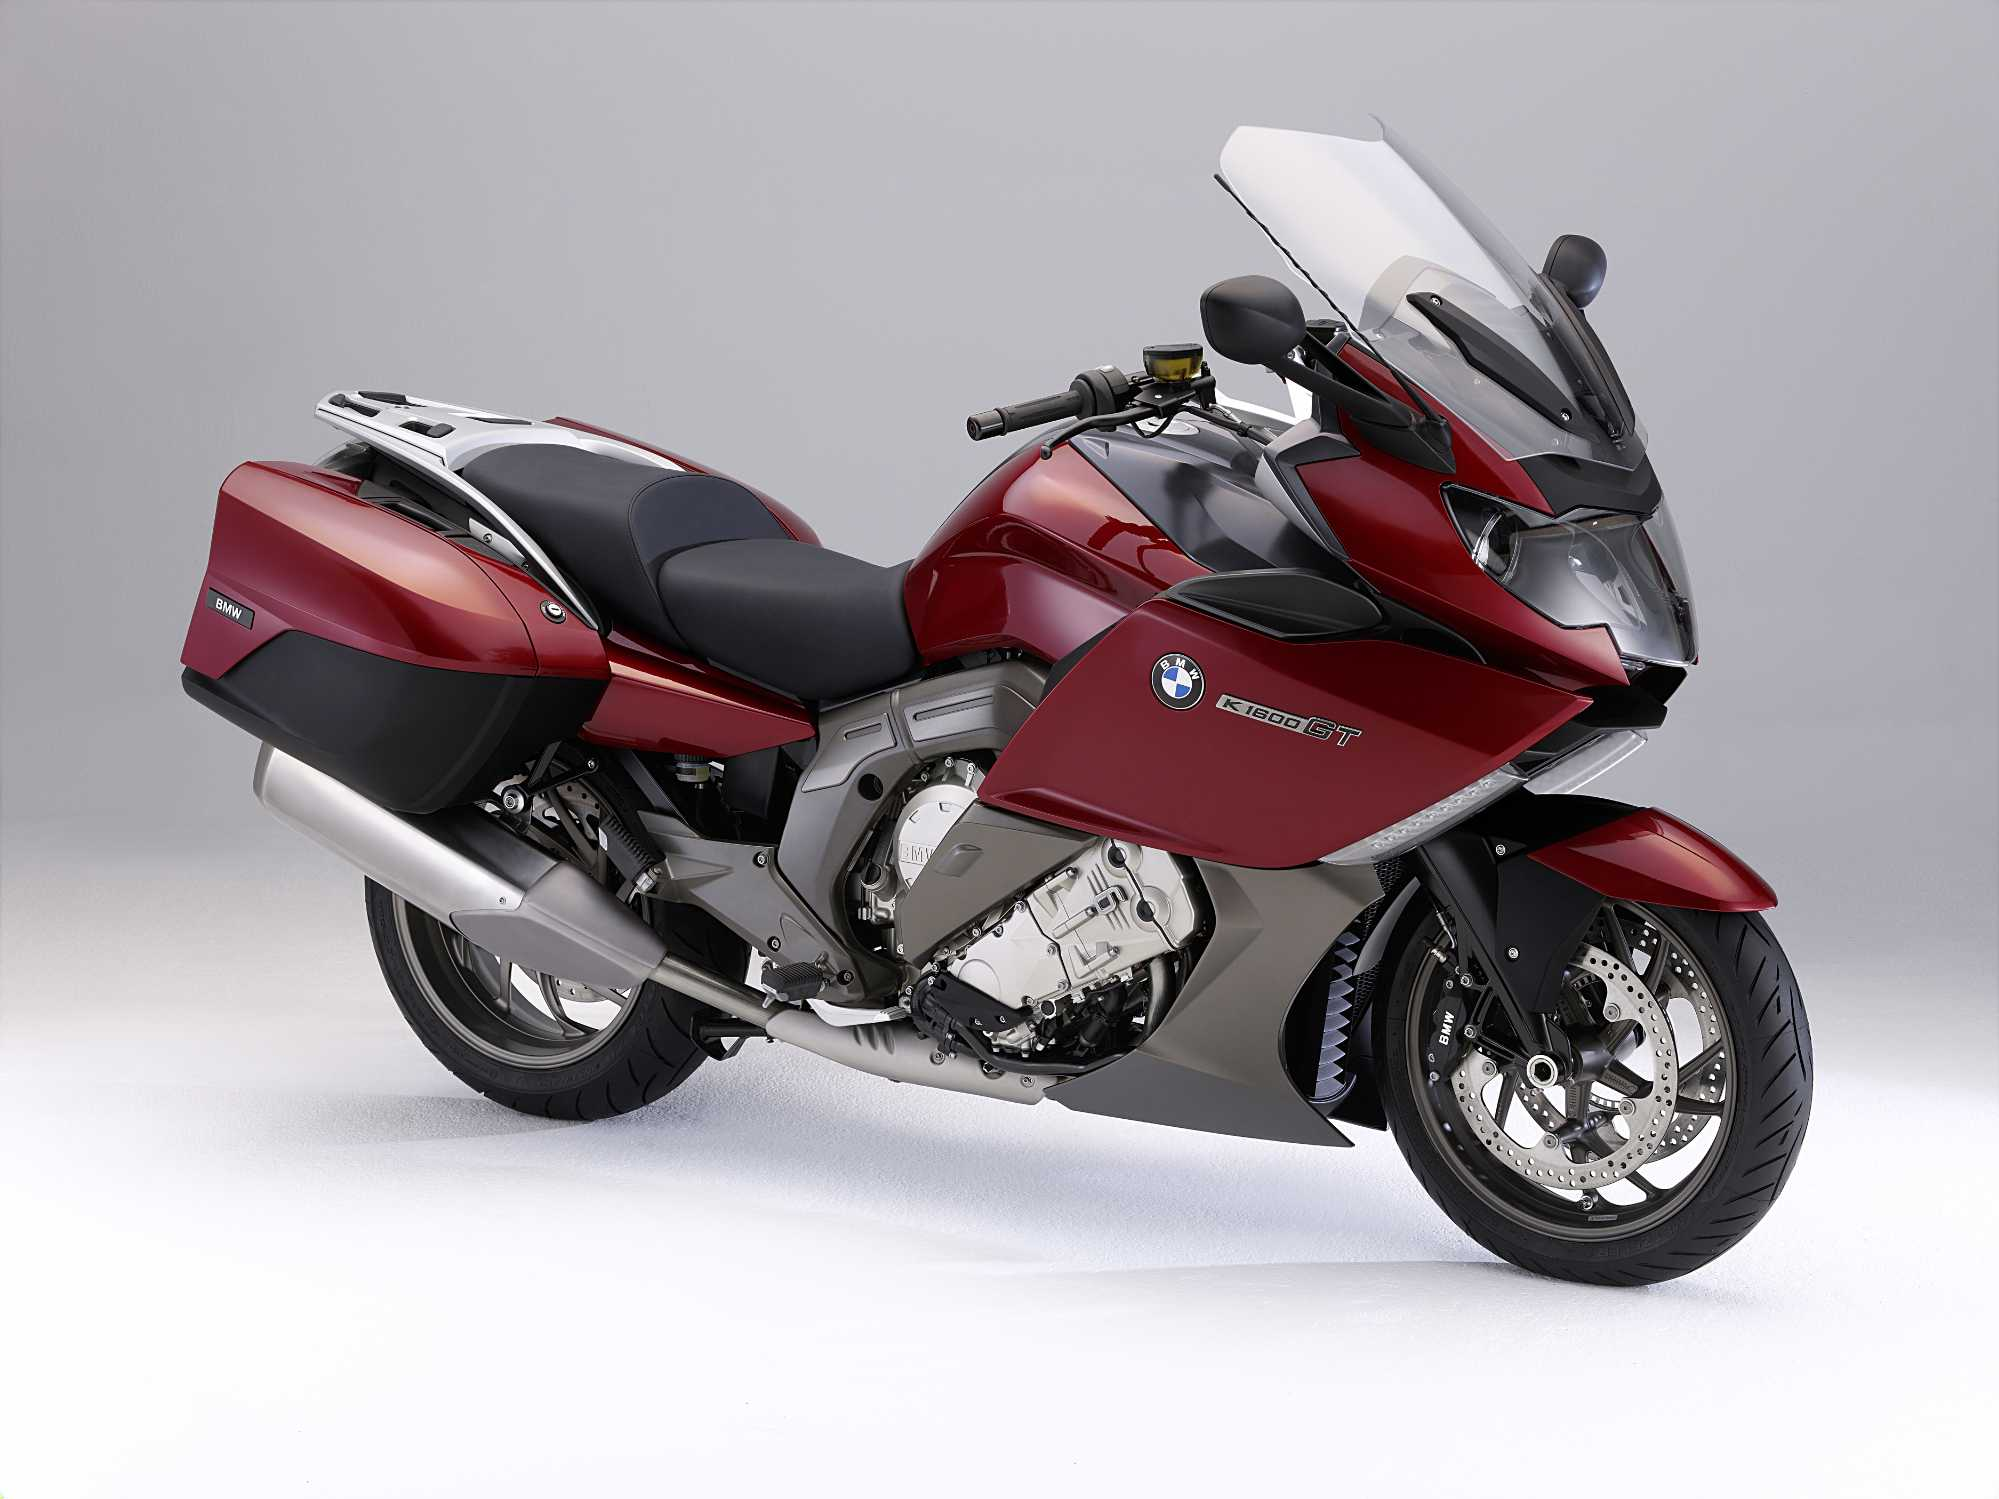 Мотоцикл БМВ k1600gt #8